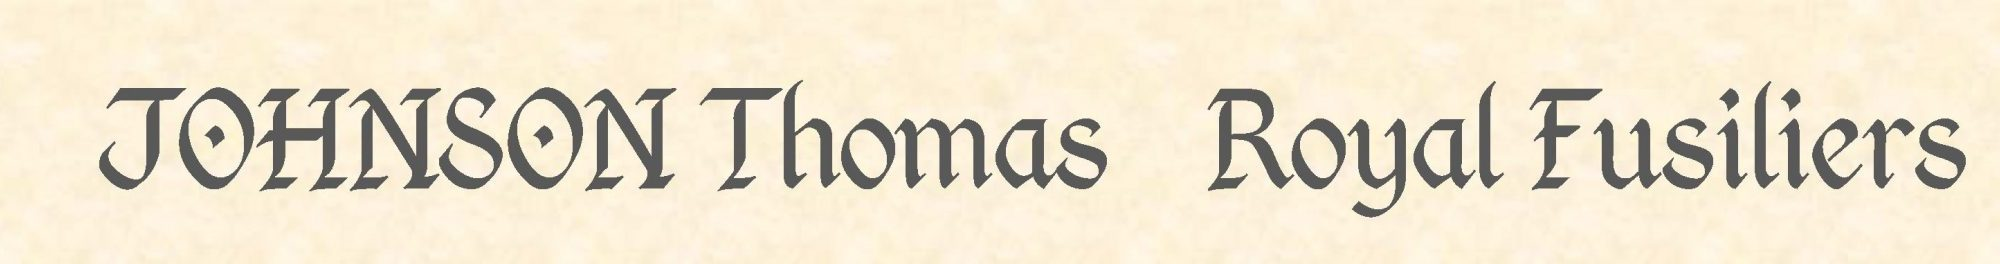 Thomas Johnson header